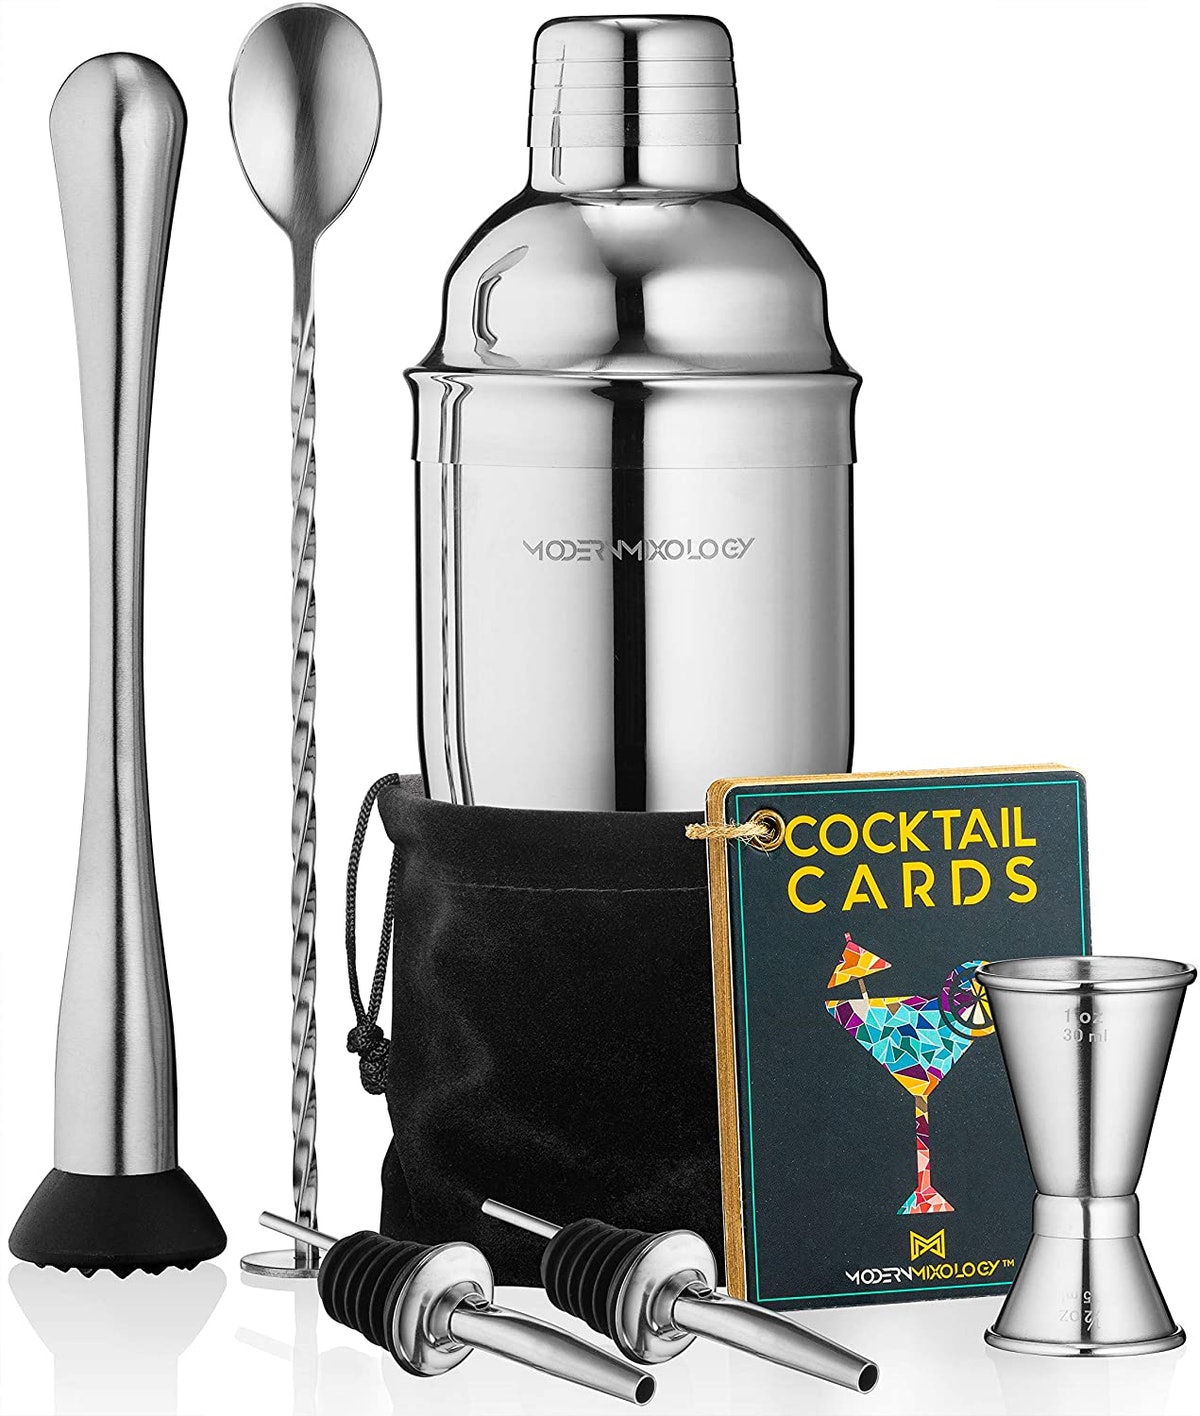 Cocktail Shaker Set Drink Mixer (8-Piece Kit)